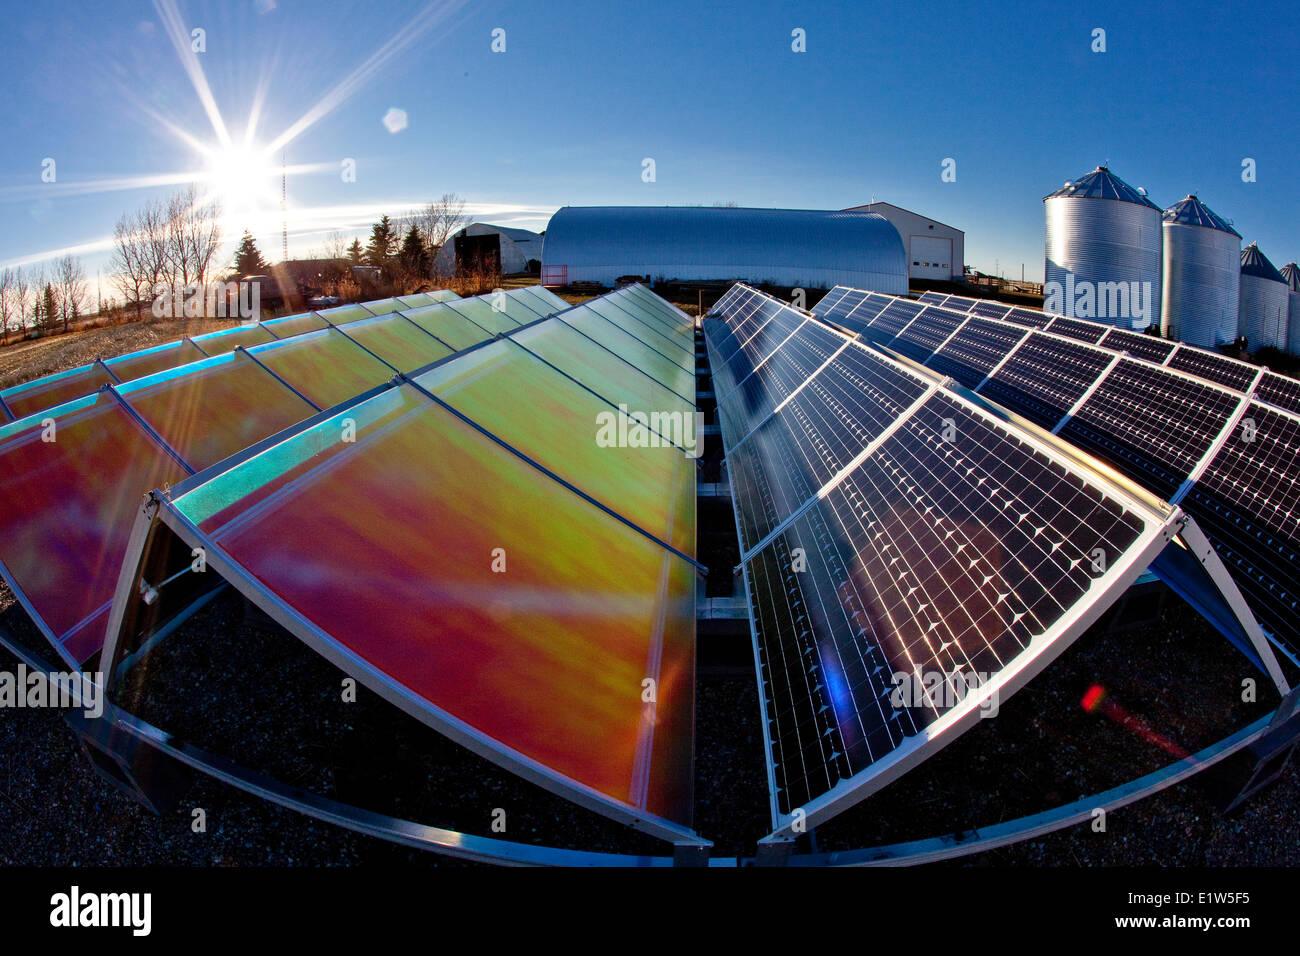 Solar panels and reflectors (to boost efficiency) on farm near Calgary, Alberta, Canada. - Stock Image